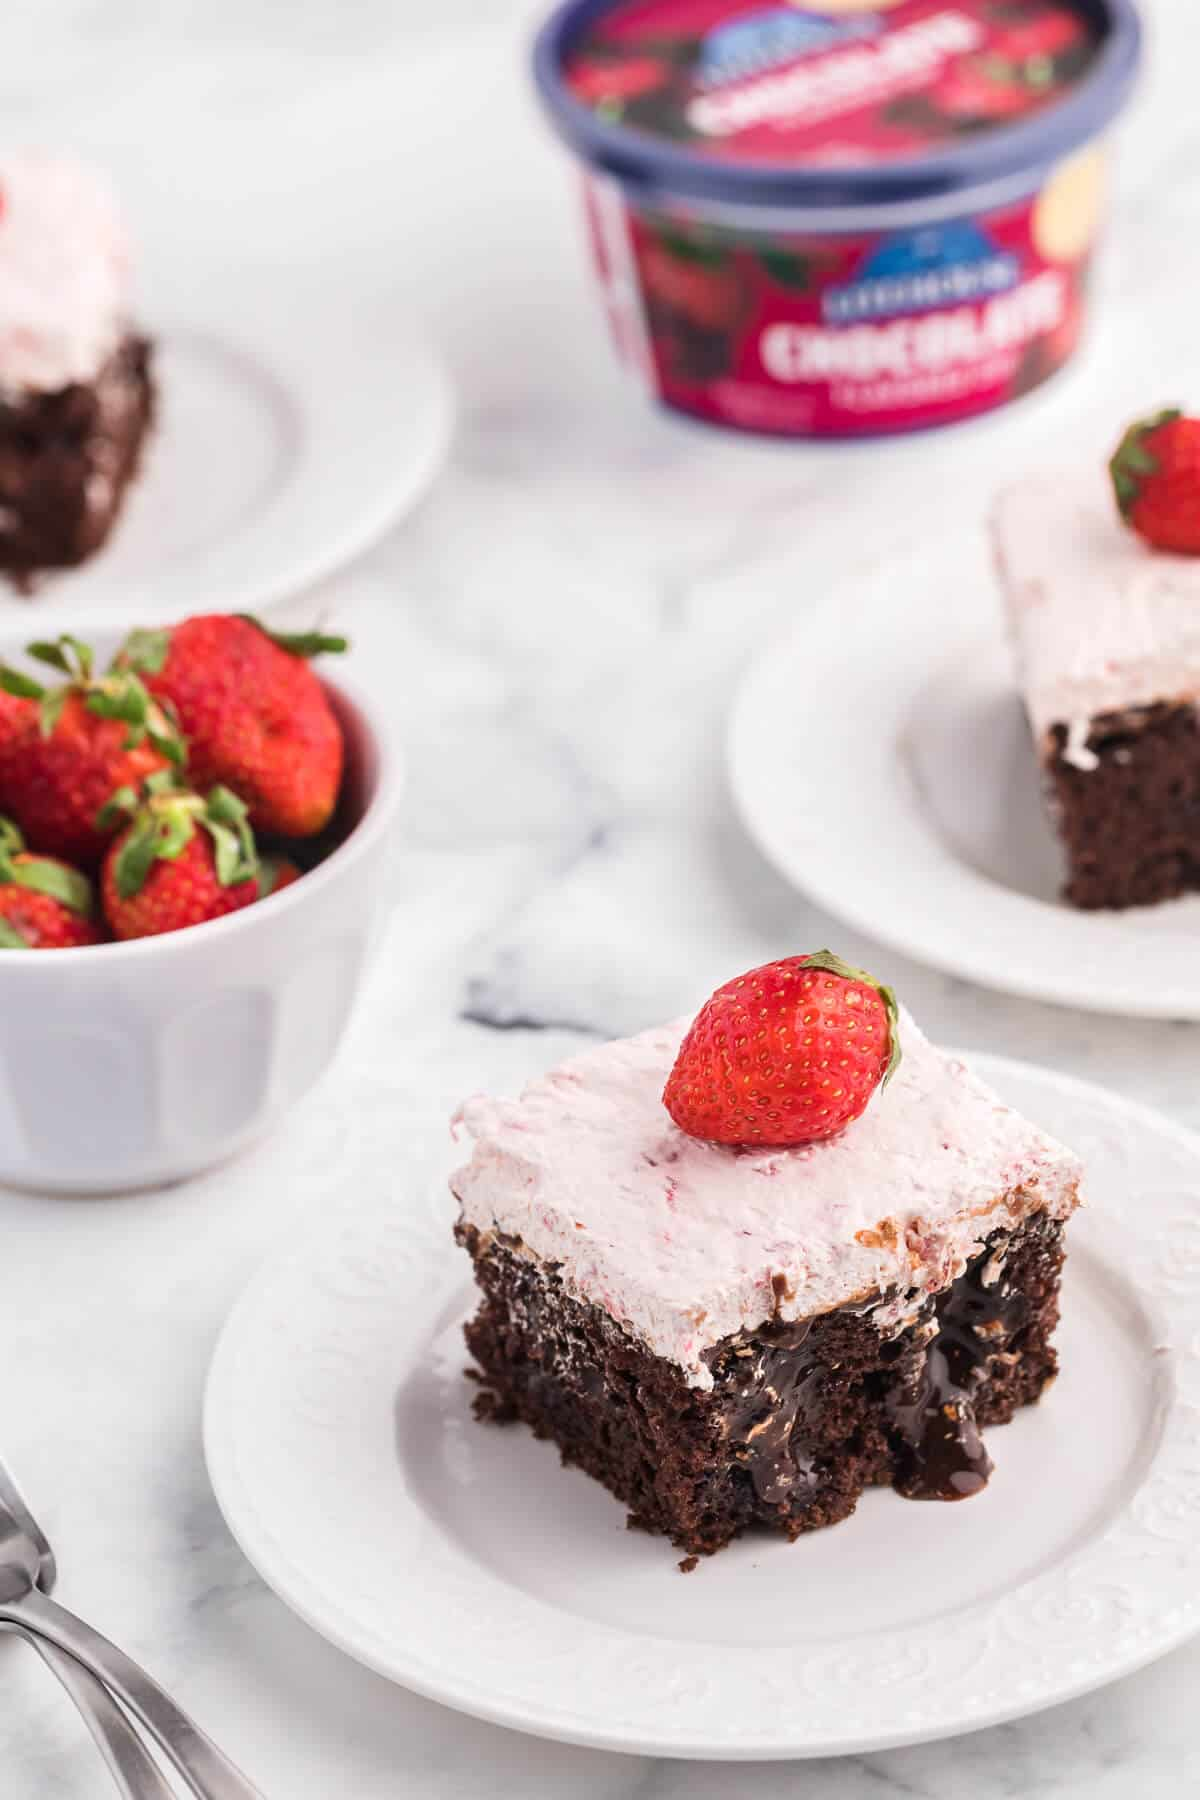 Strawberry and Chocolate Poke Cake